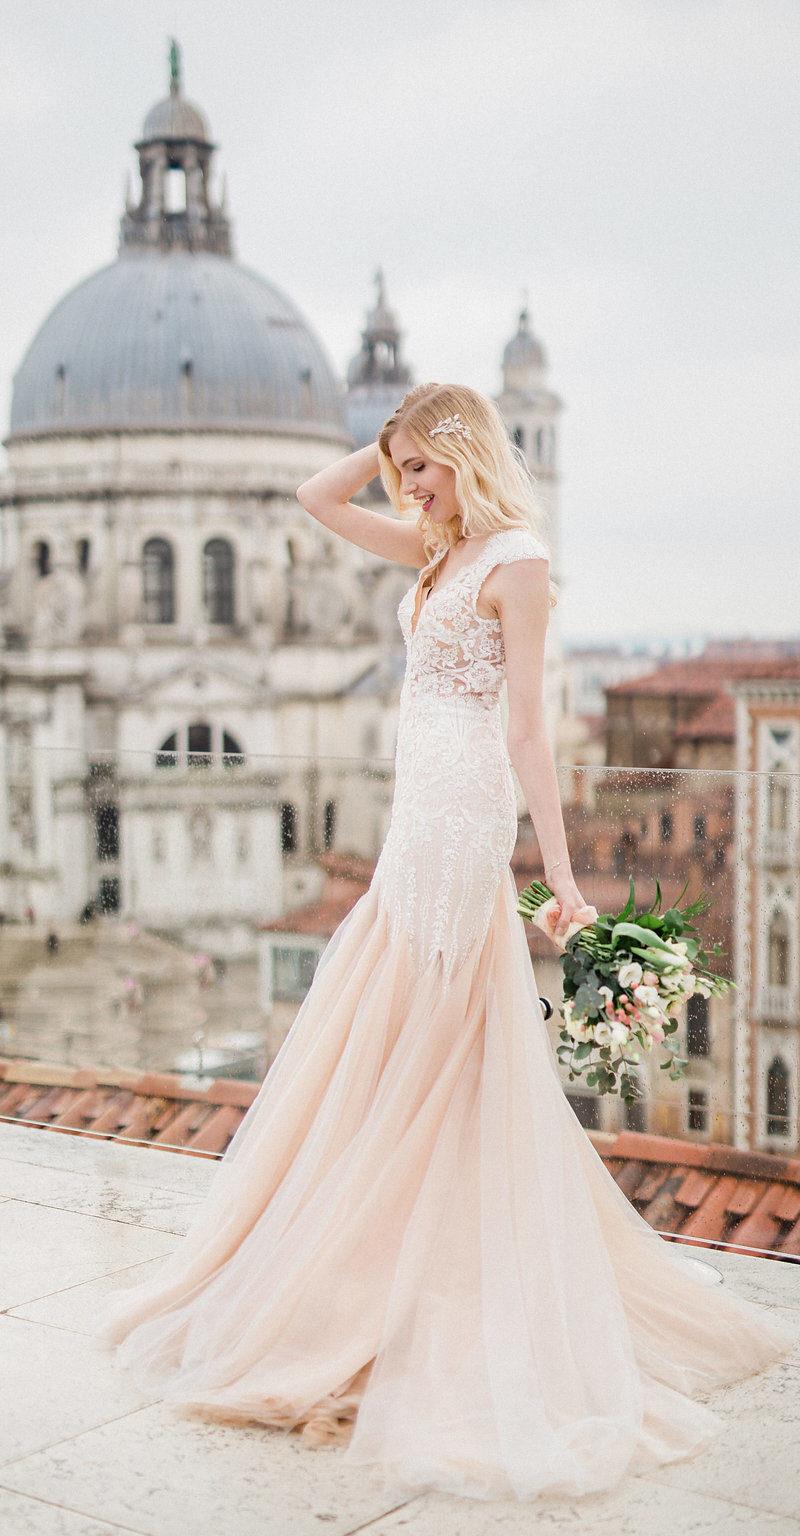 Bridal Shakespearean Shooting Venice